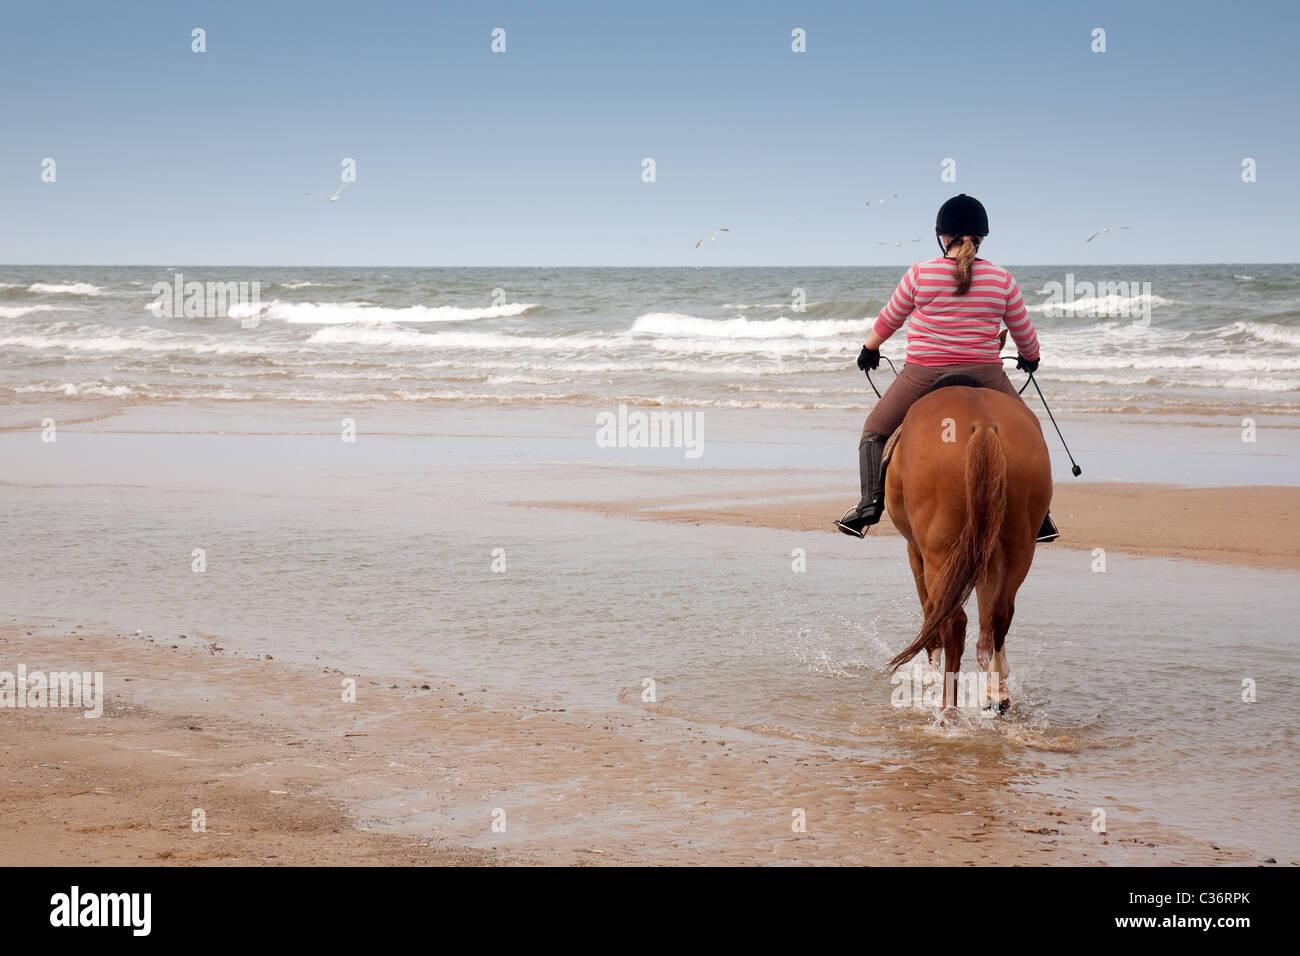 A teenage girl on her horse,Holkham beach, North Norfolk, UK - Stock Image